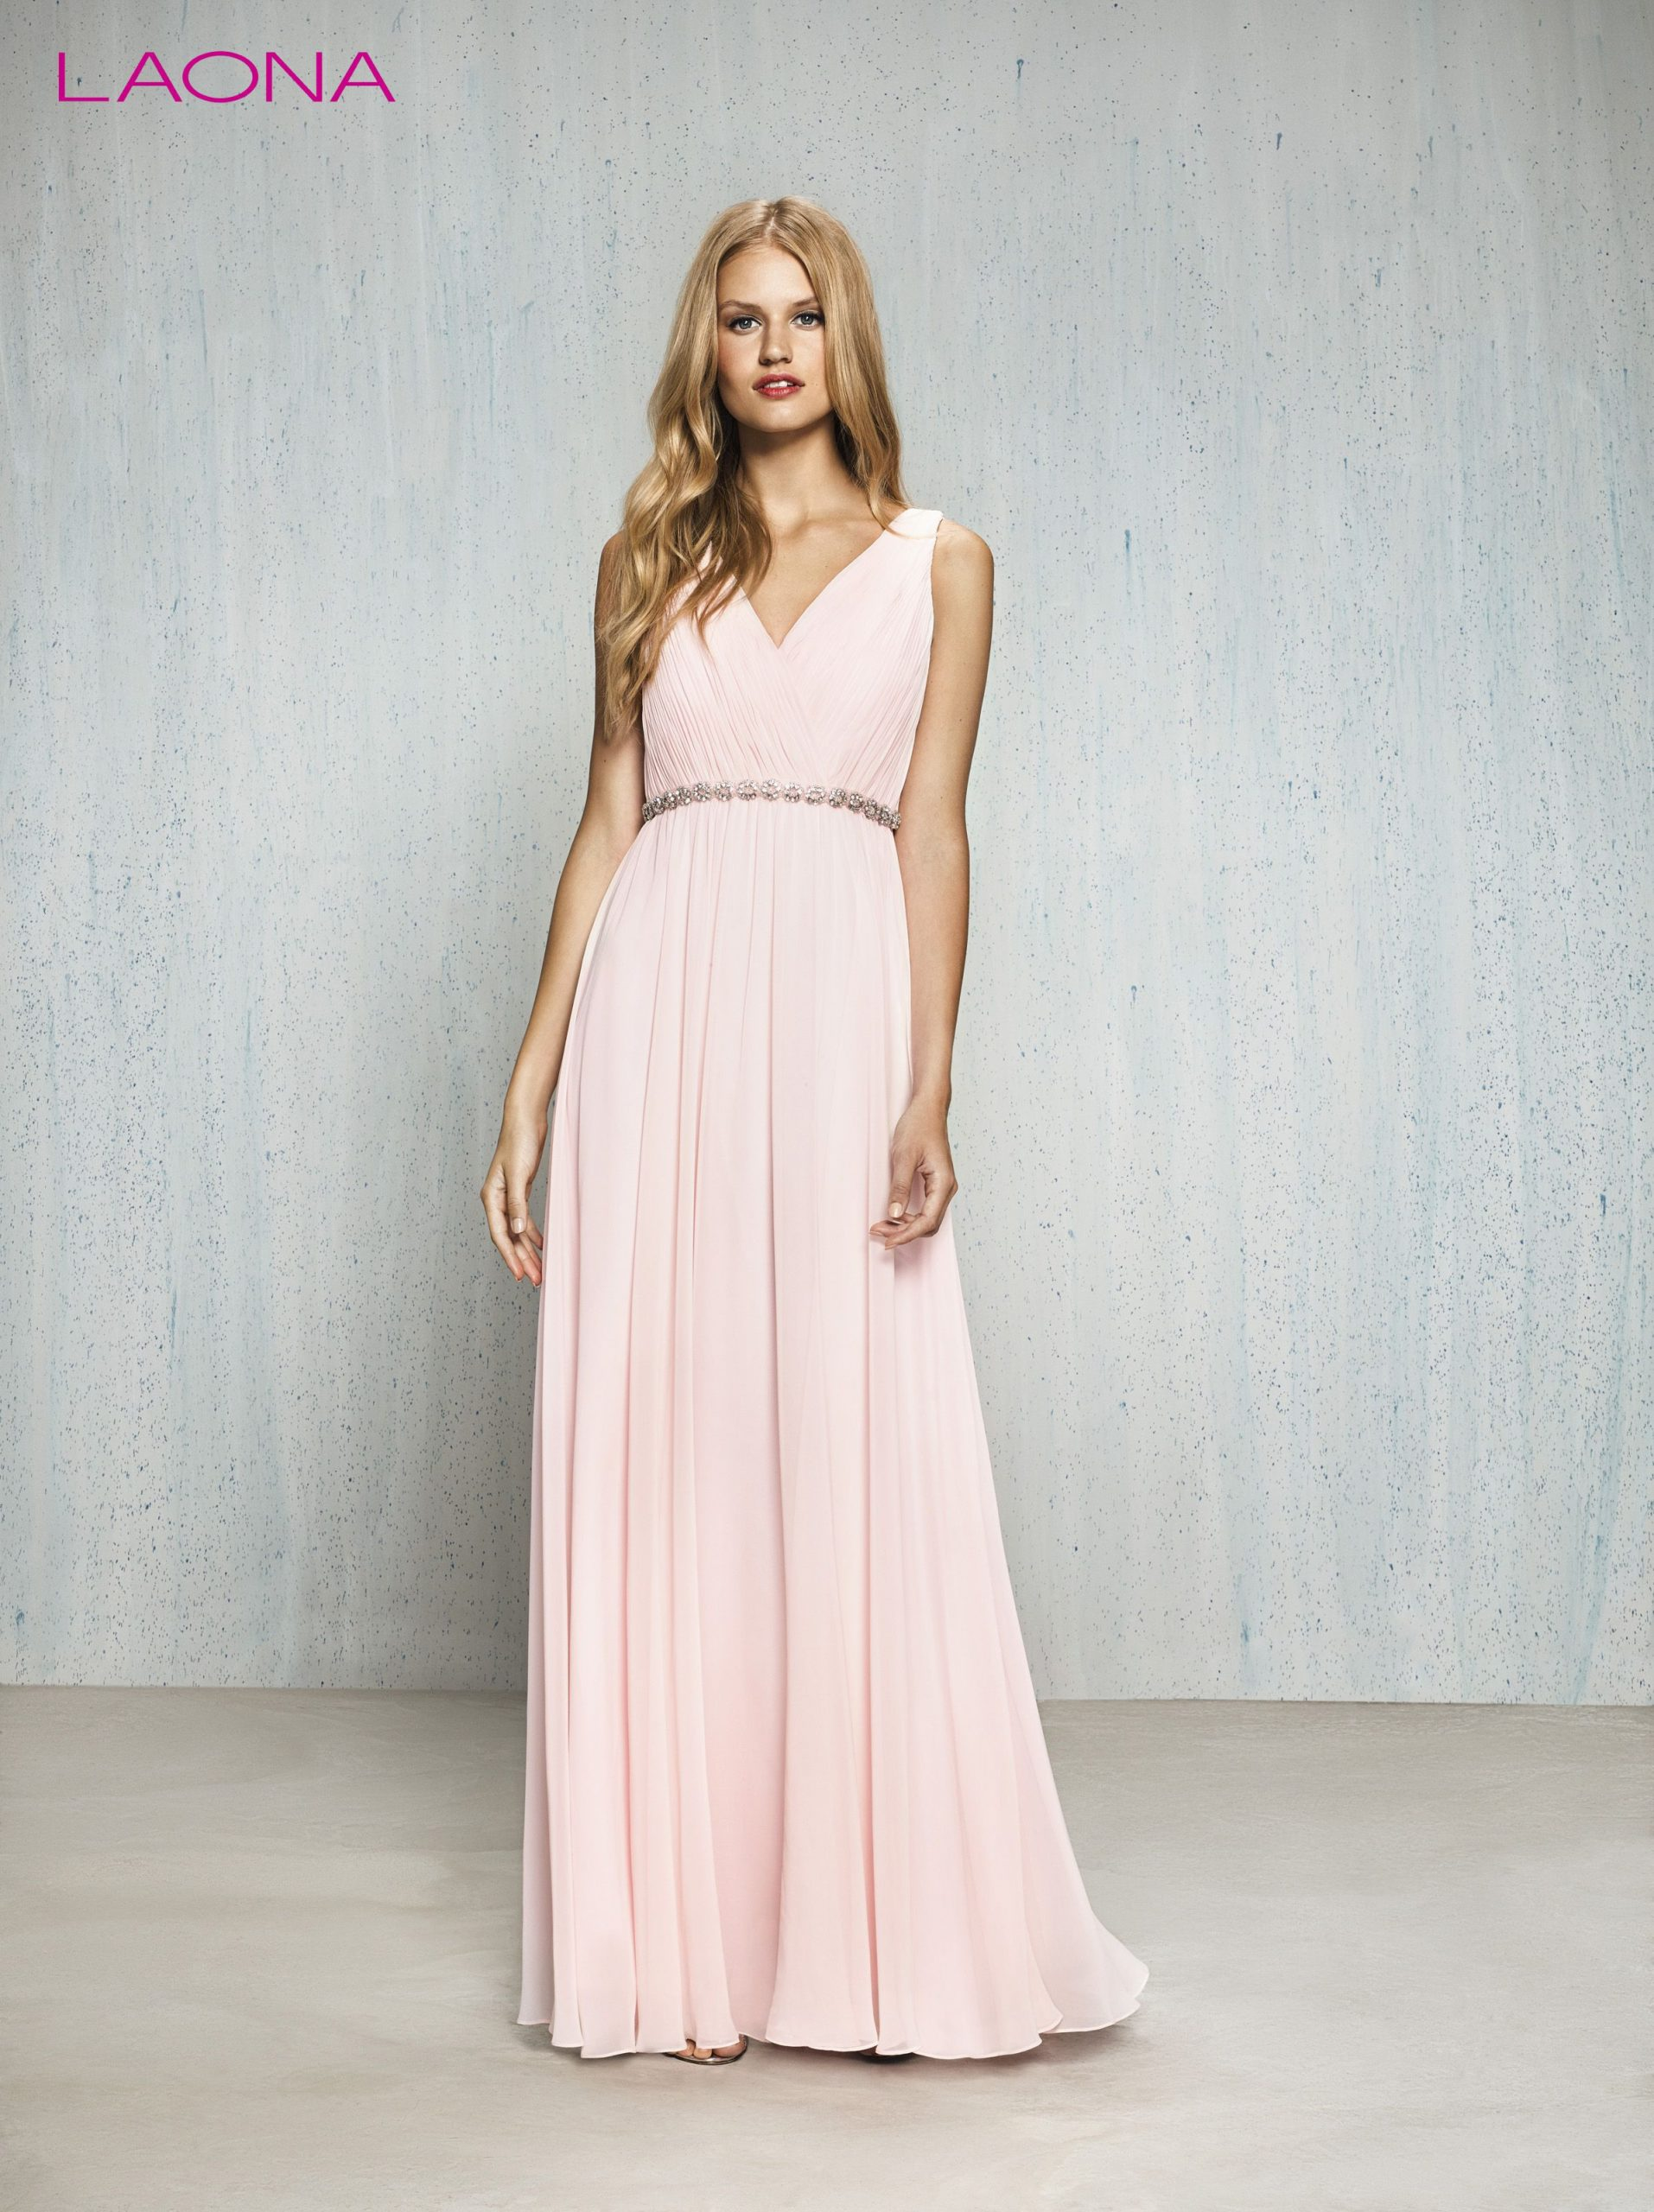 Cool Abendkleider Jora Vertrieb20 Genial Abendkleider Jora Vertrieb